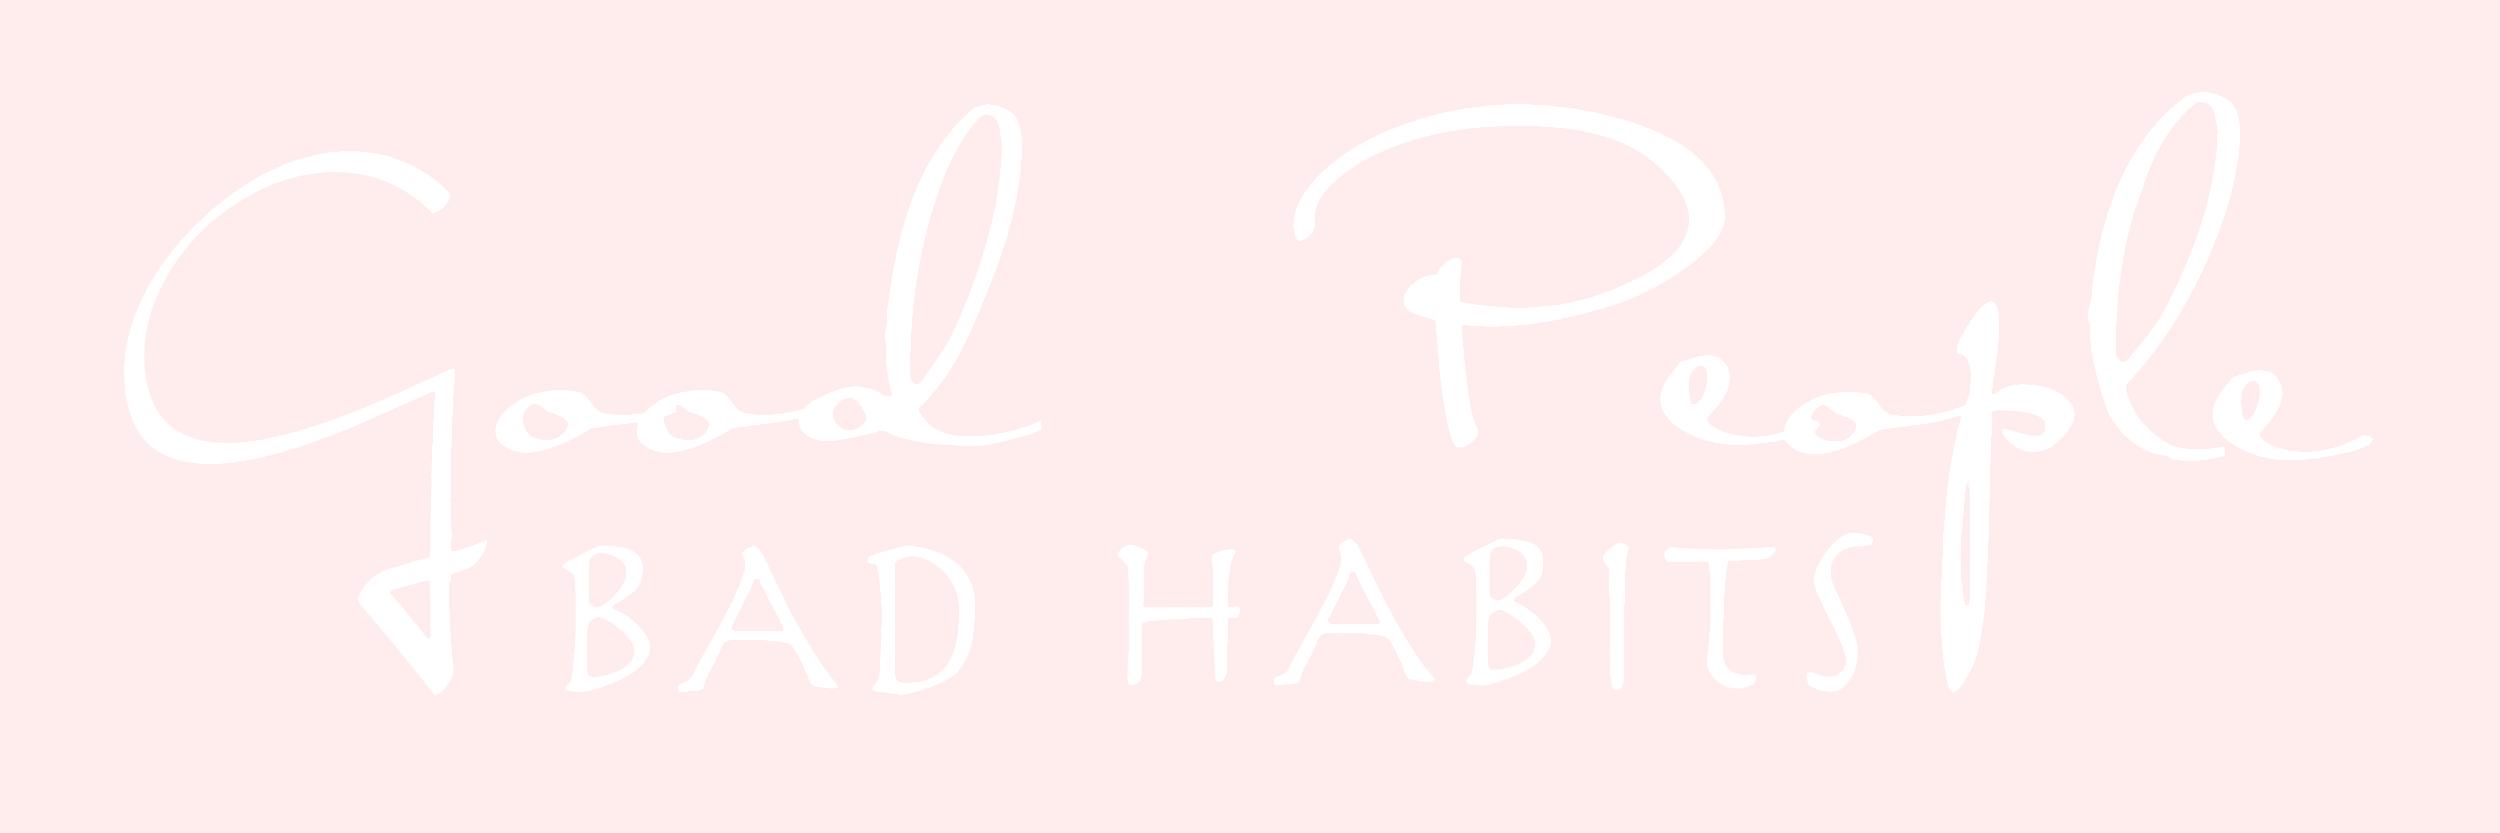 goodpplbadhabits logo.png